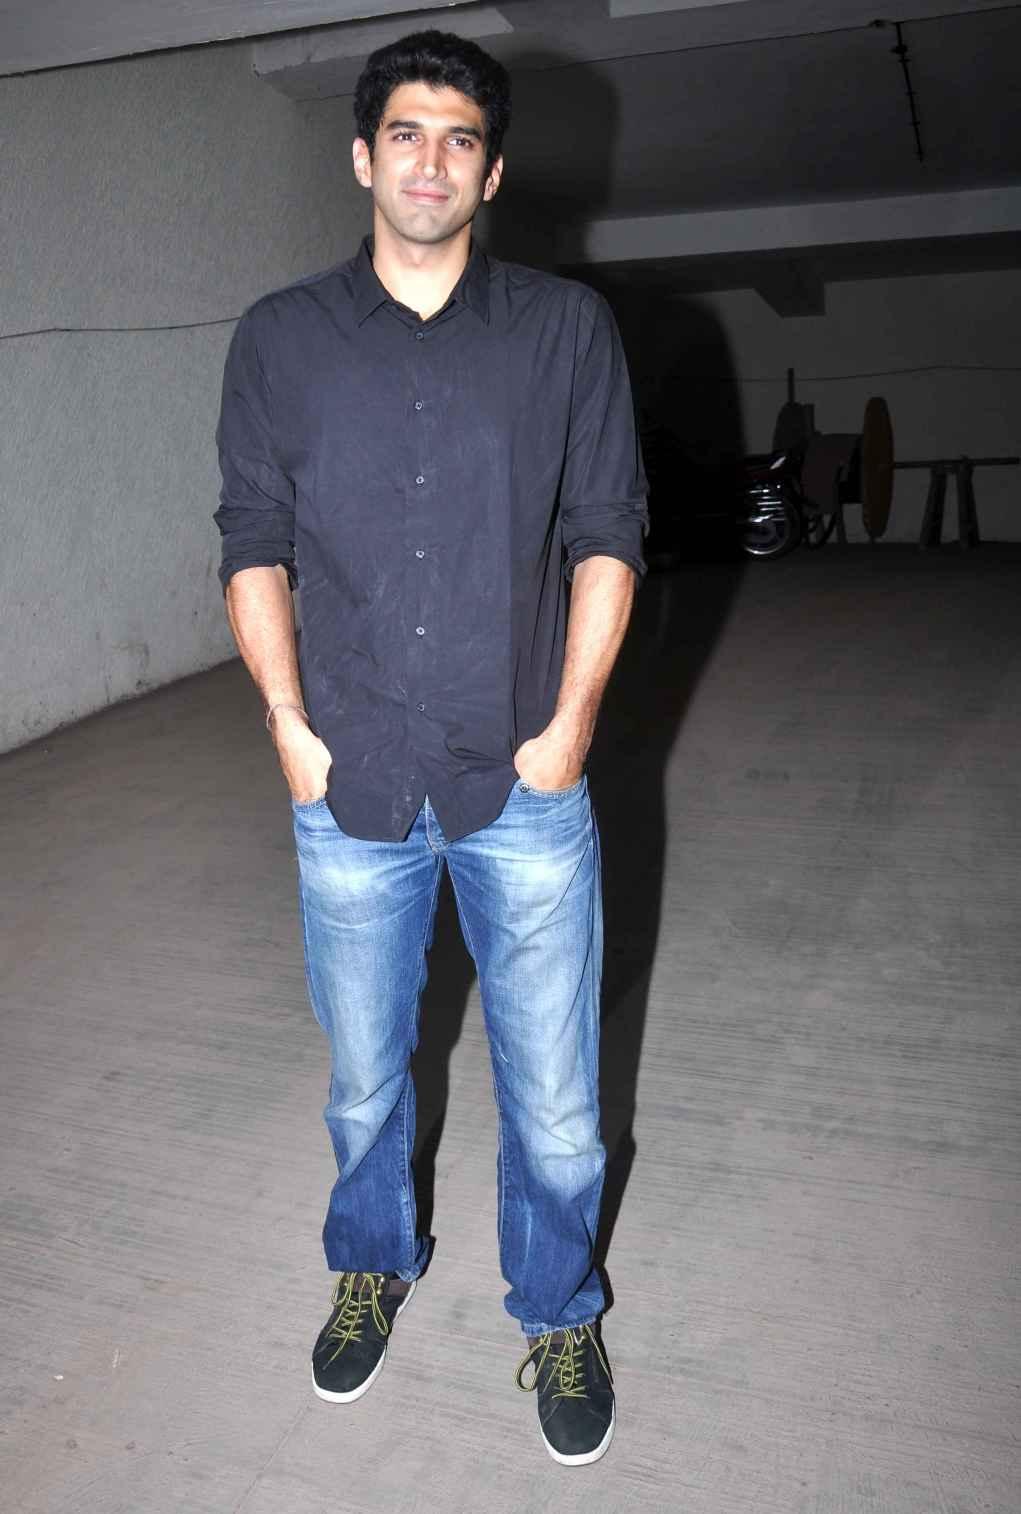 Aditya Roy Kapur Workout and Diet